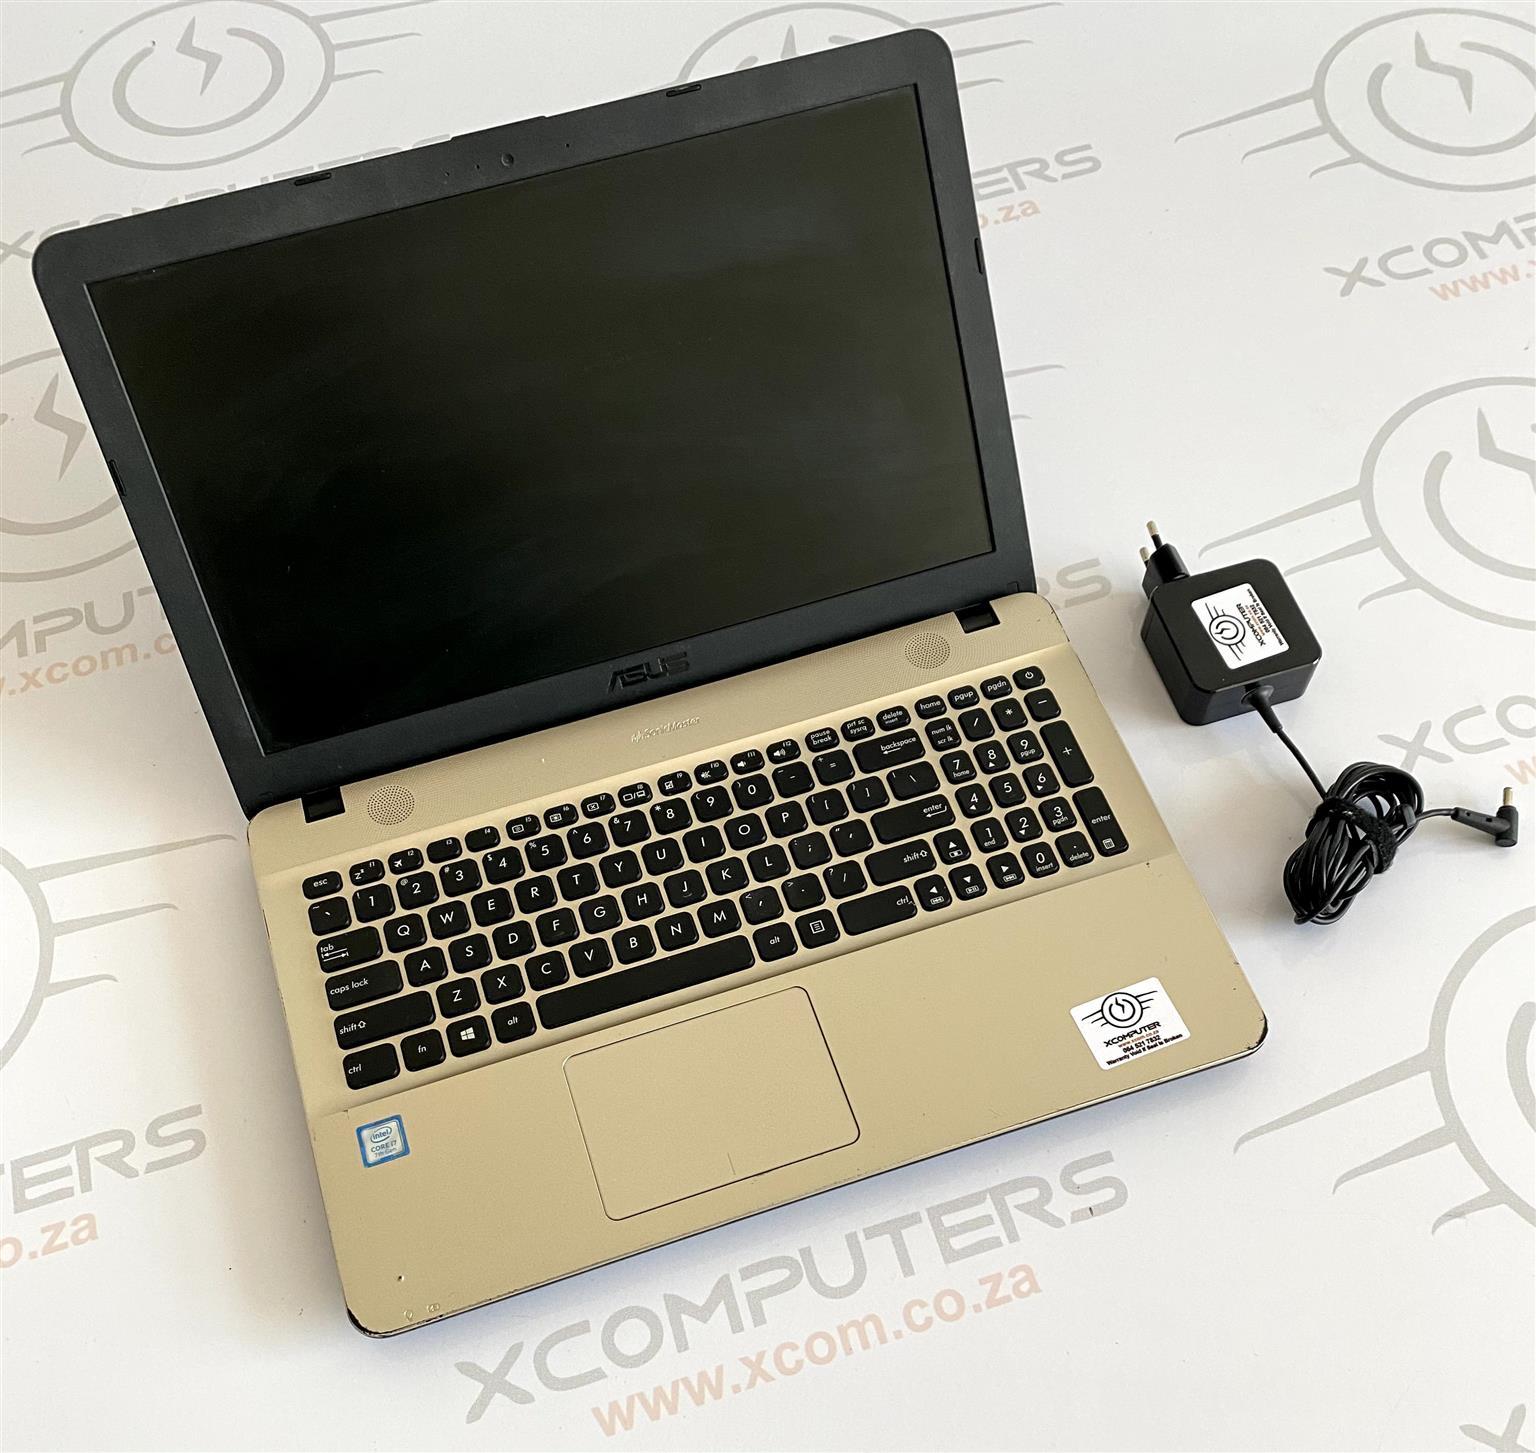 Asus Super Fast Core i7 Laptop R6900